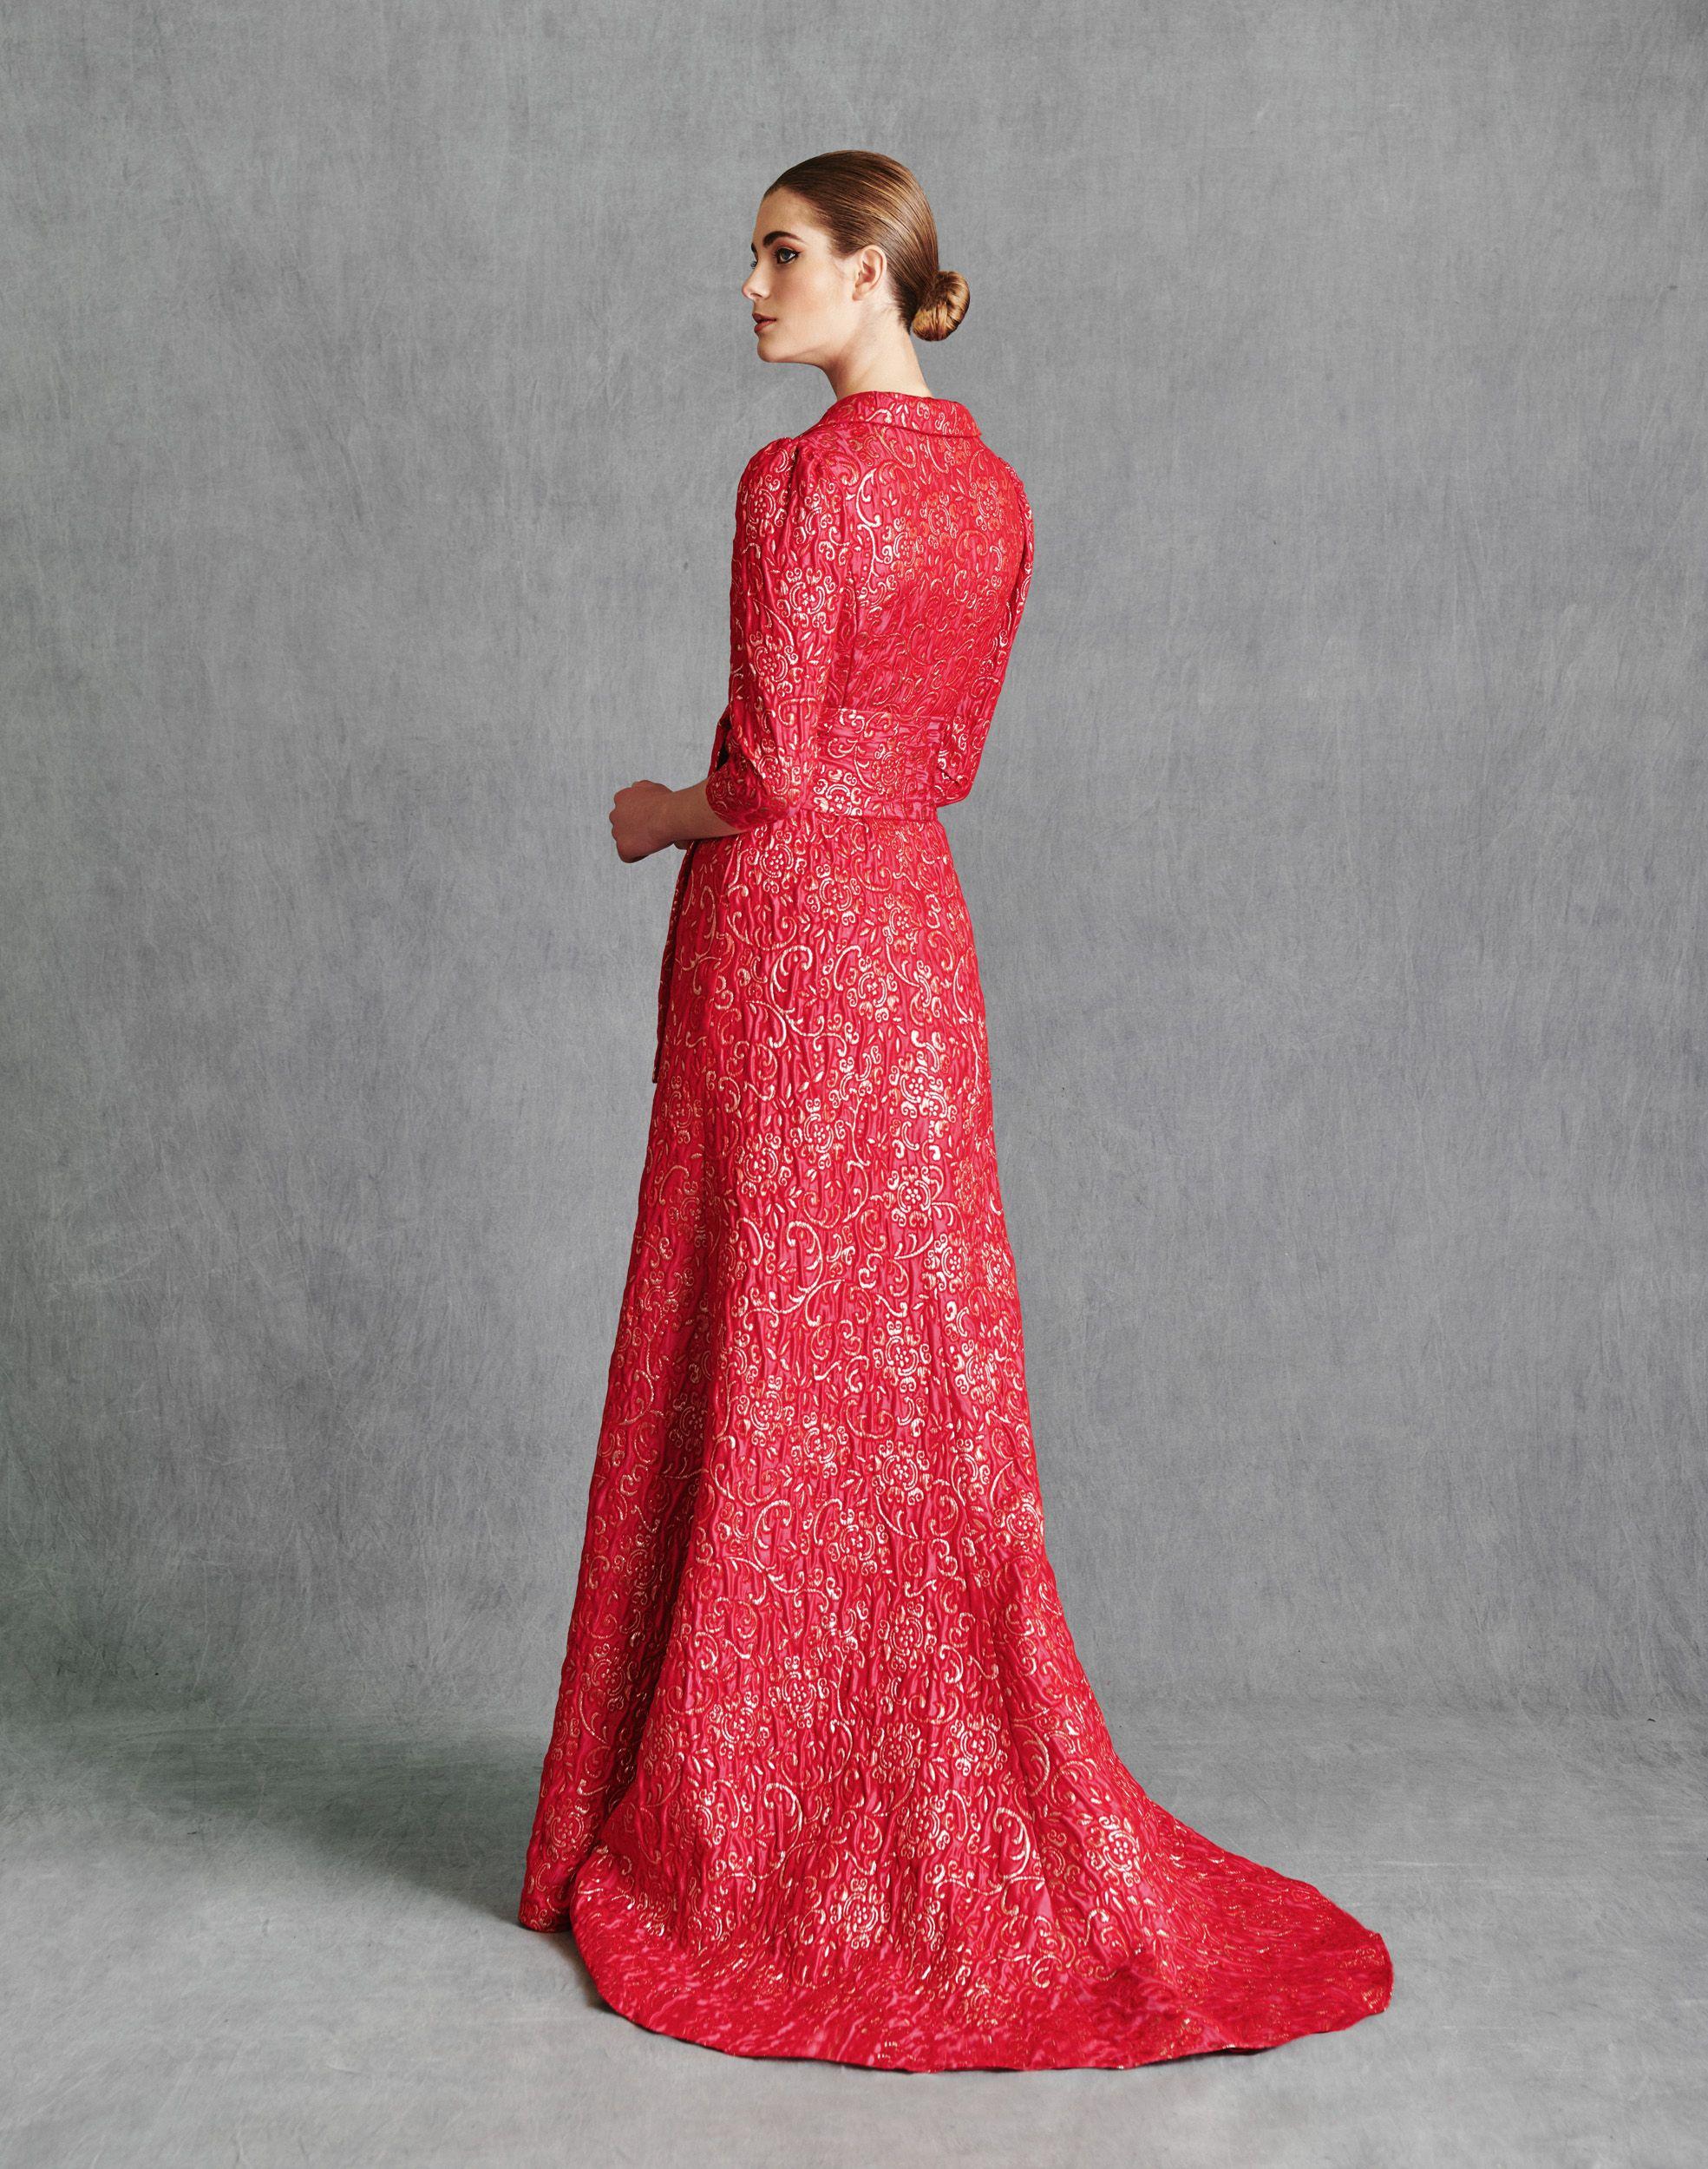 Vestidos de Fiesta 2020 - Silvia Fernandez Atelier - ITZIAR - detras